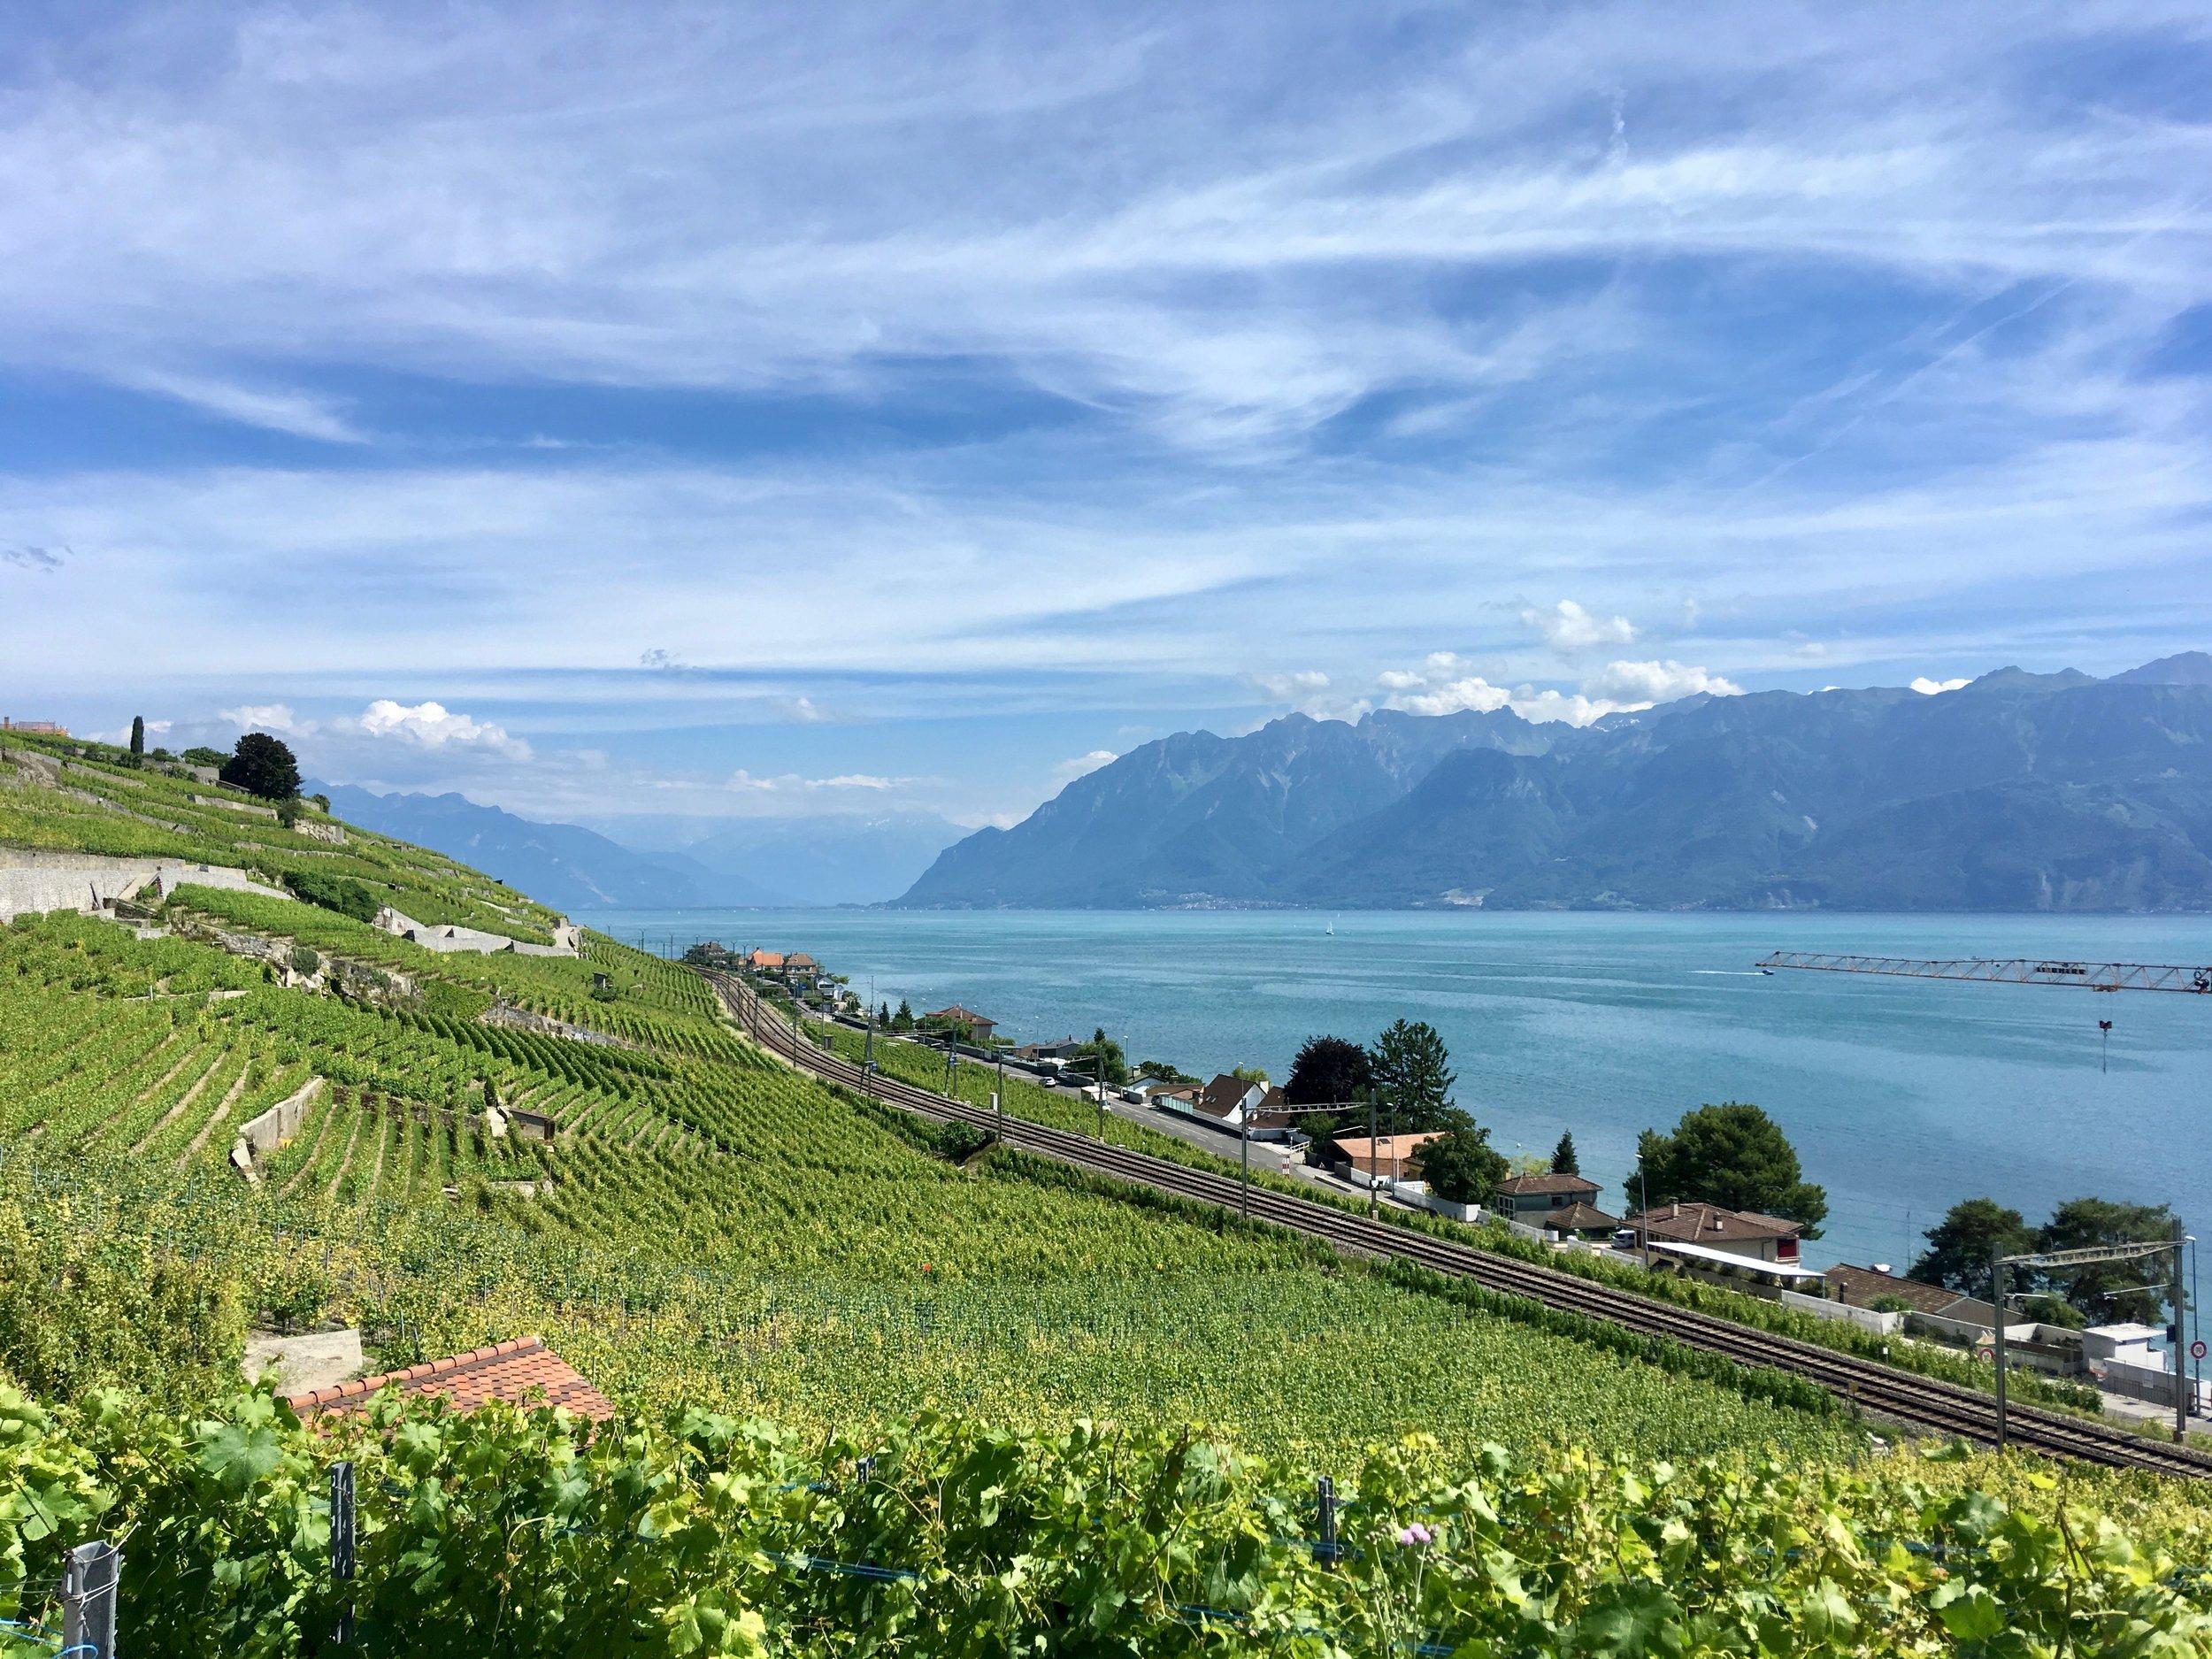 Cully, Switzerland